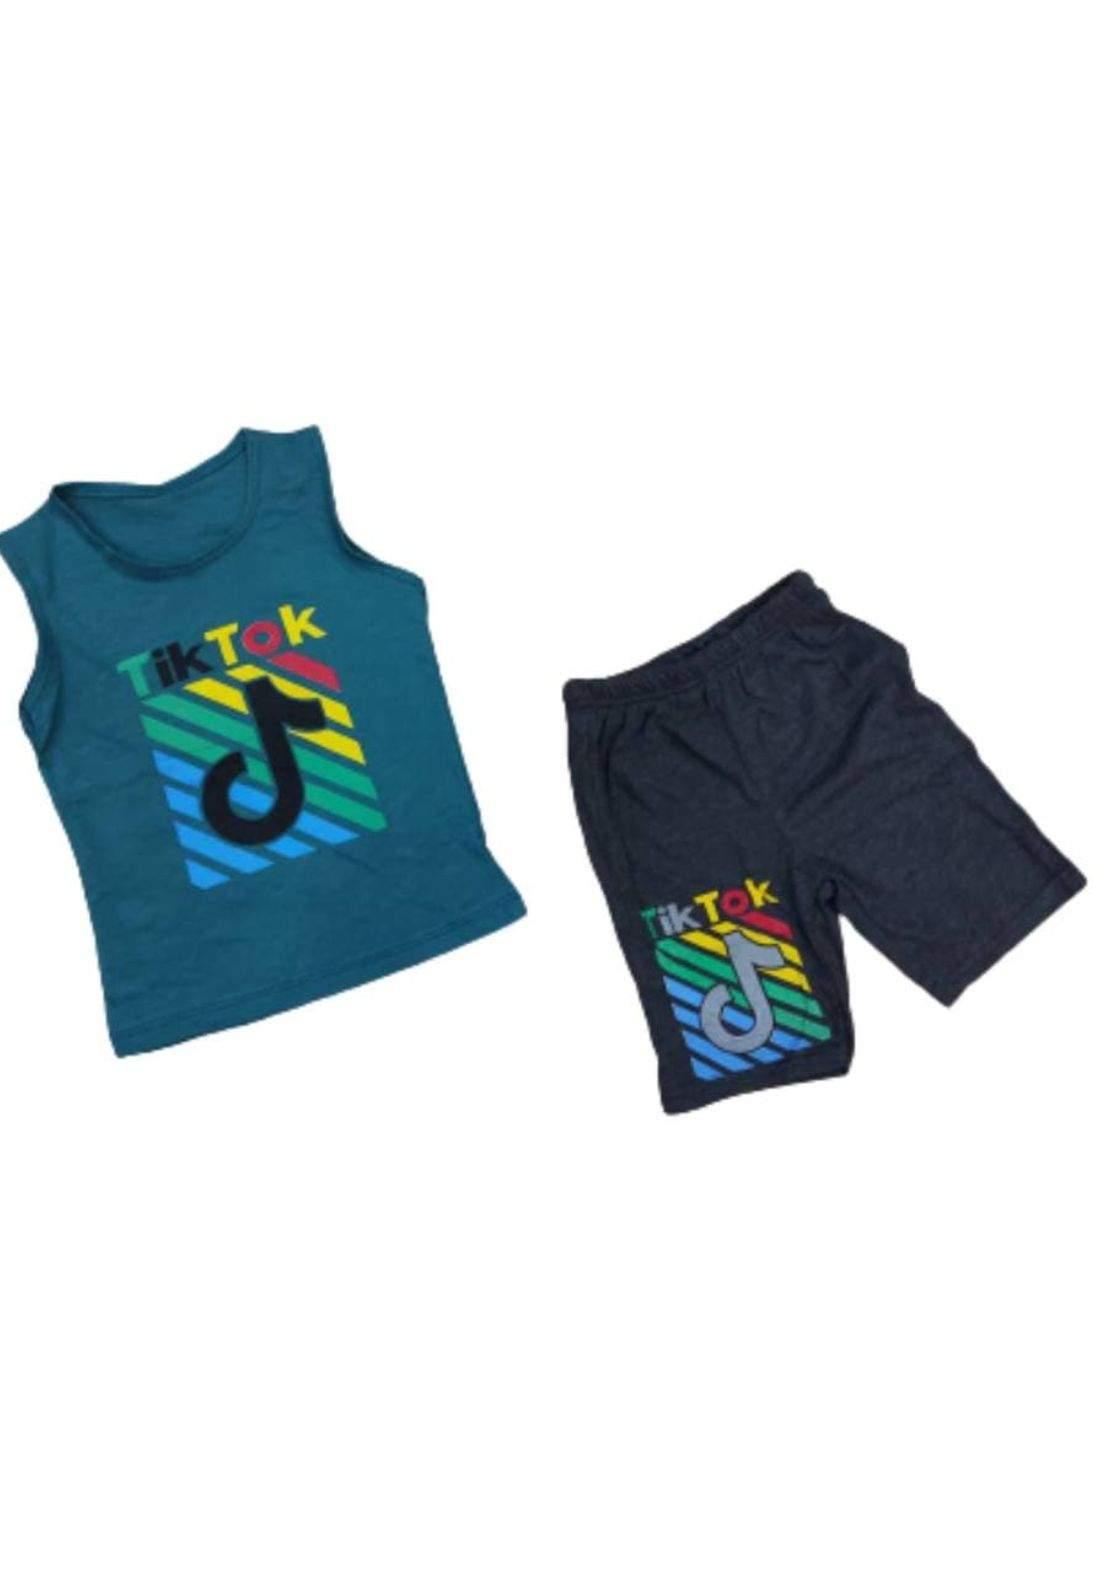 tracksuit for boys Olive (shirt +short) ( تراكسوت ولادي زيتوني (برموده وكيمونه